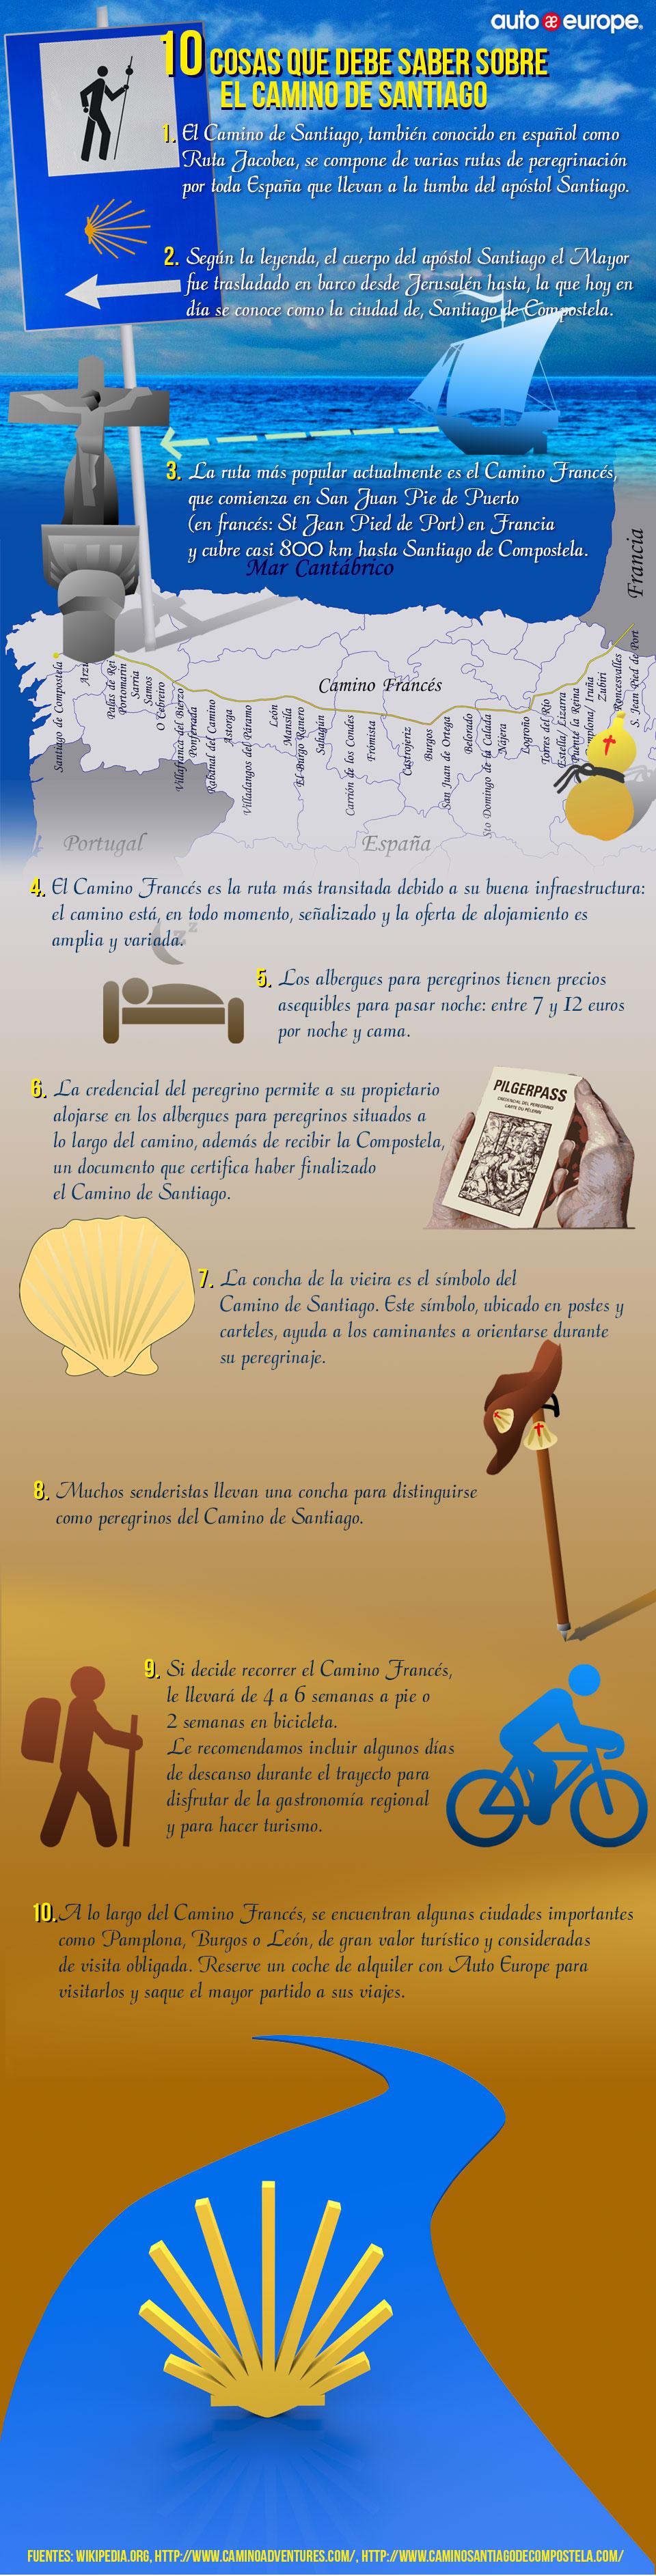 Infografía: Camino de Santiago